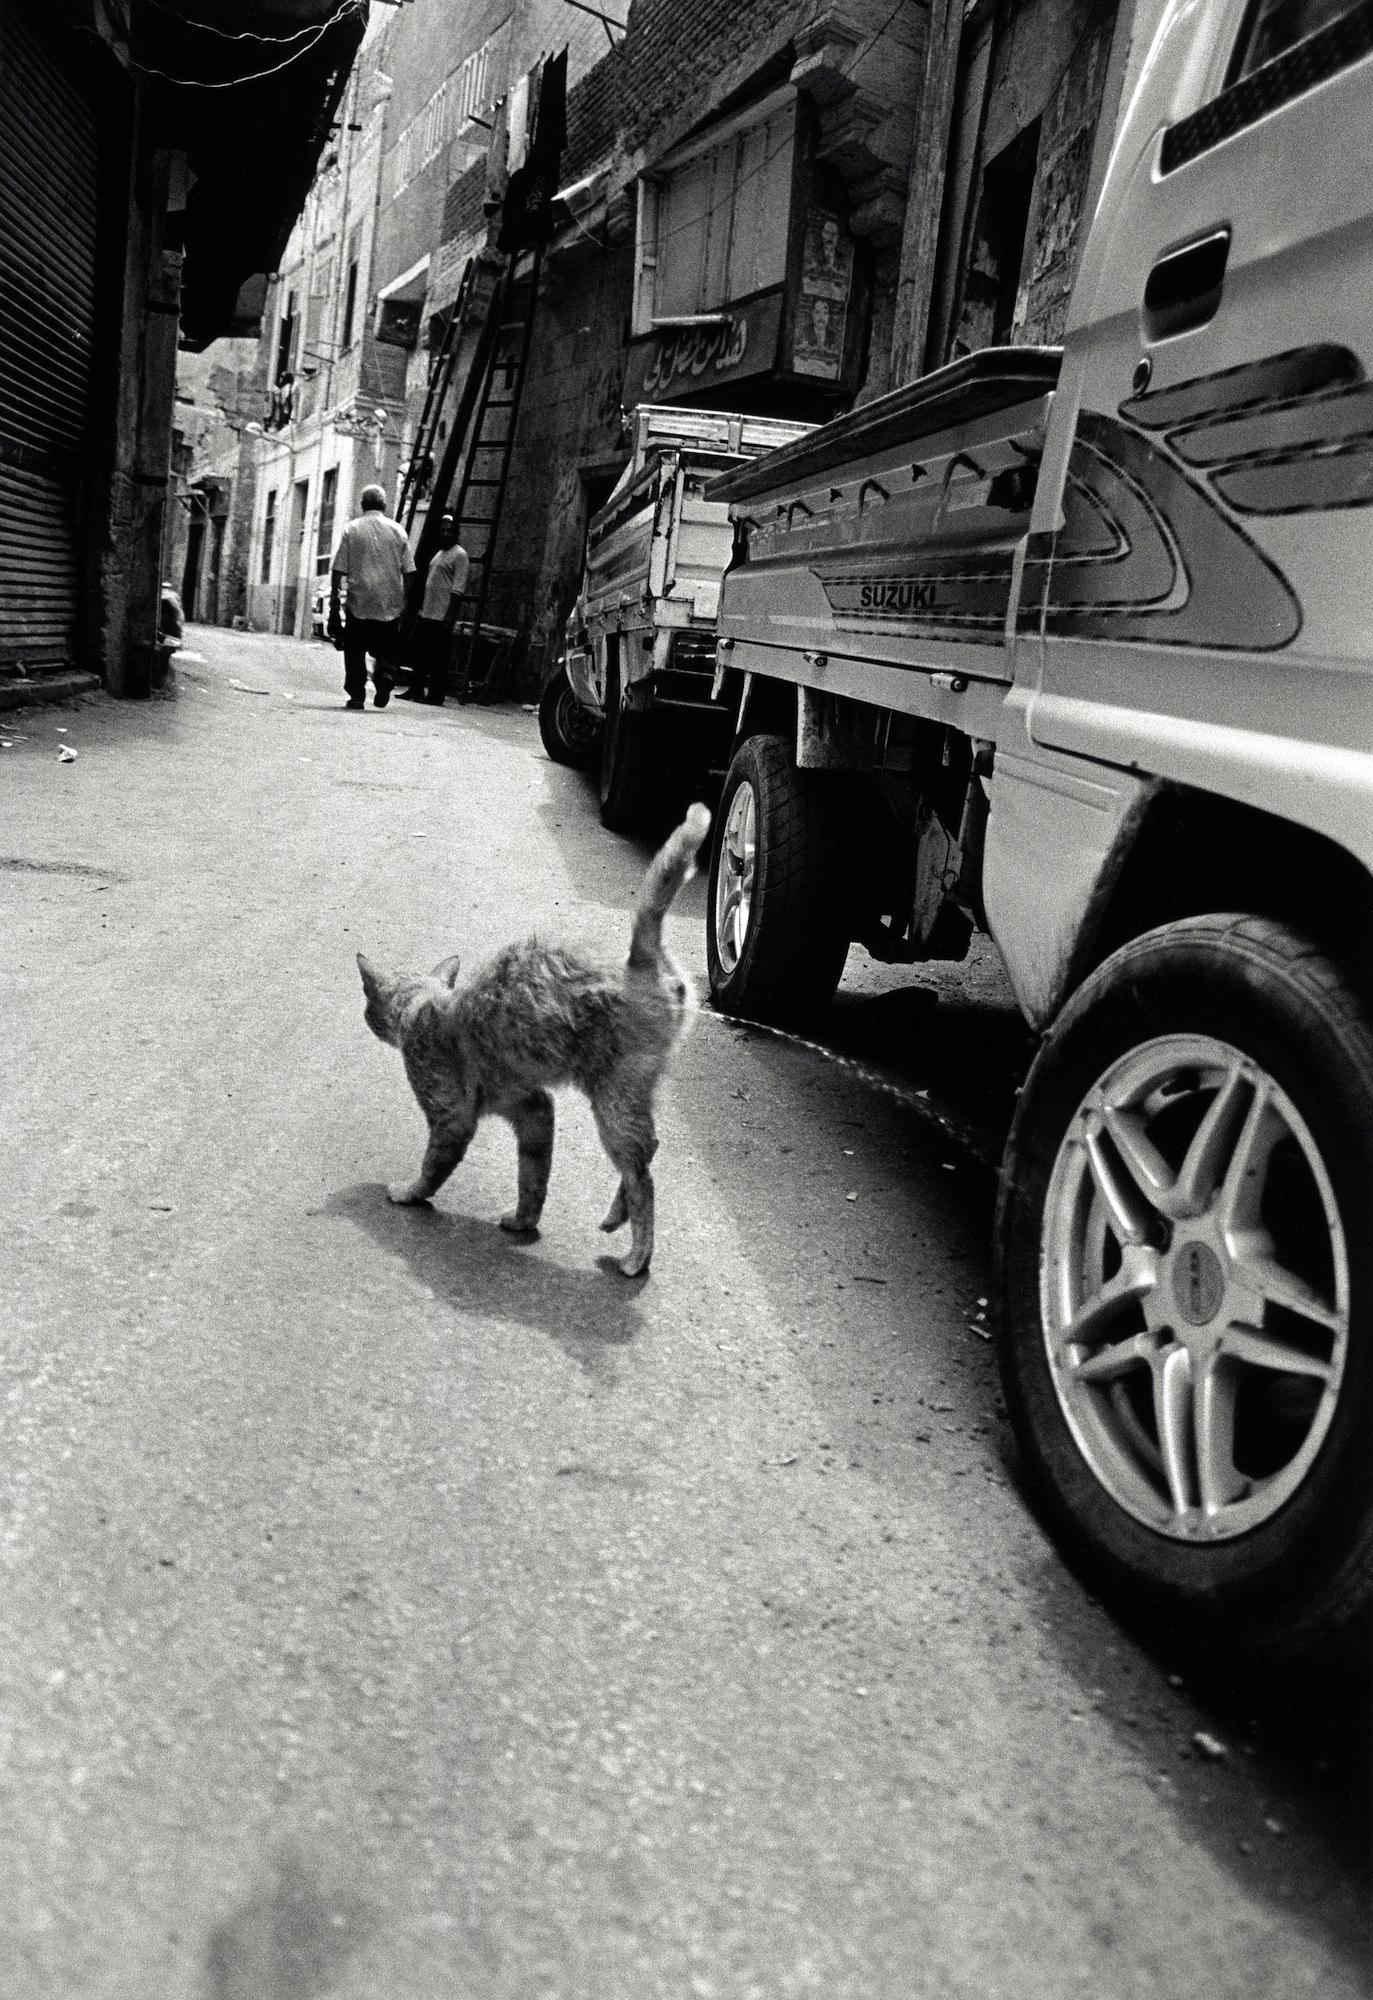 walter_rothwell_photography_cats-015.jpg